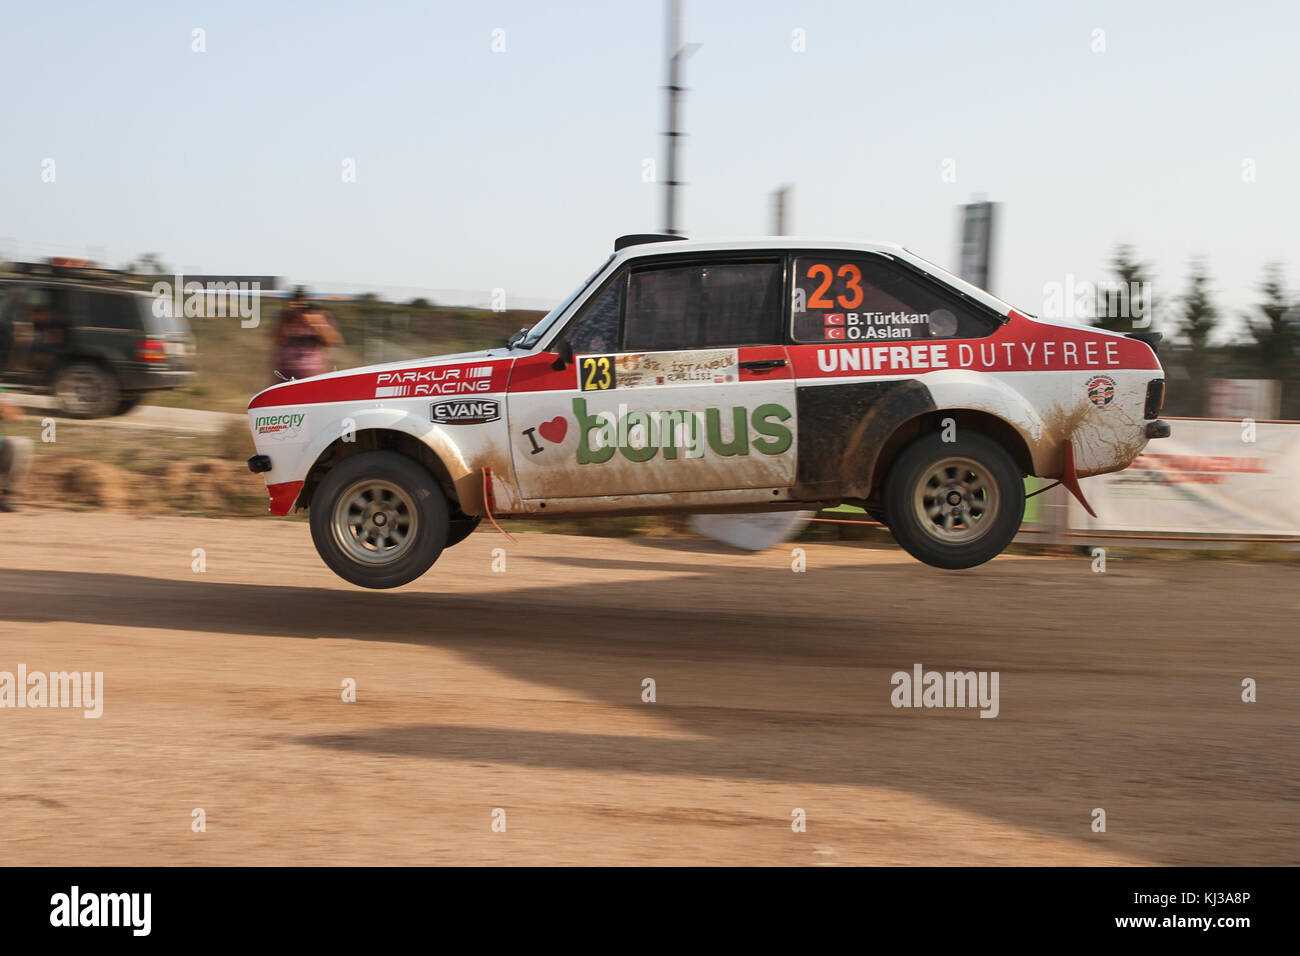 Istanbul, Türkei - 10. September 2017: Burak turkkan Antriebe Ford Escort MKII von parkur Racing Team in isok Stockbild